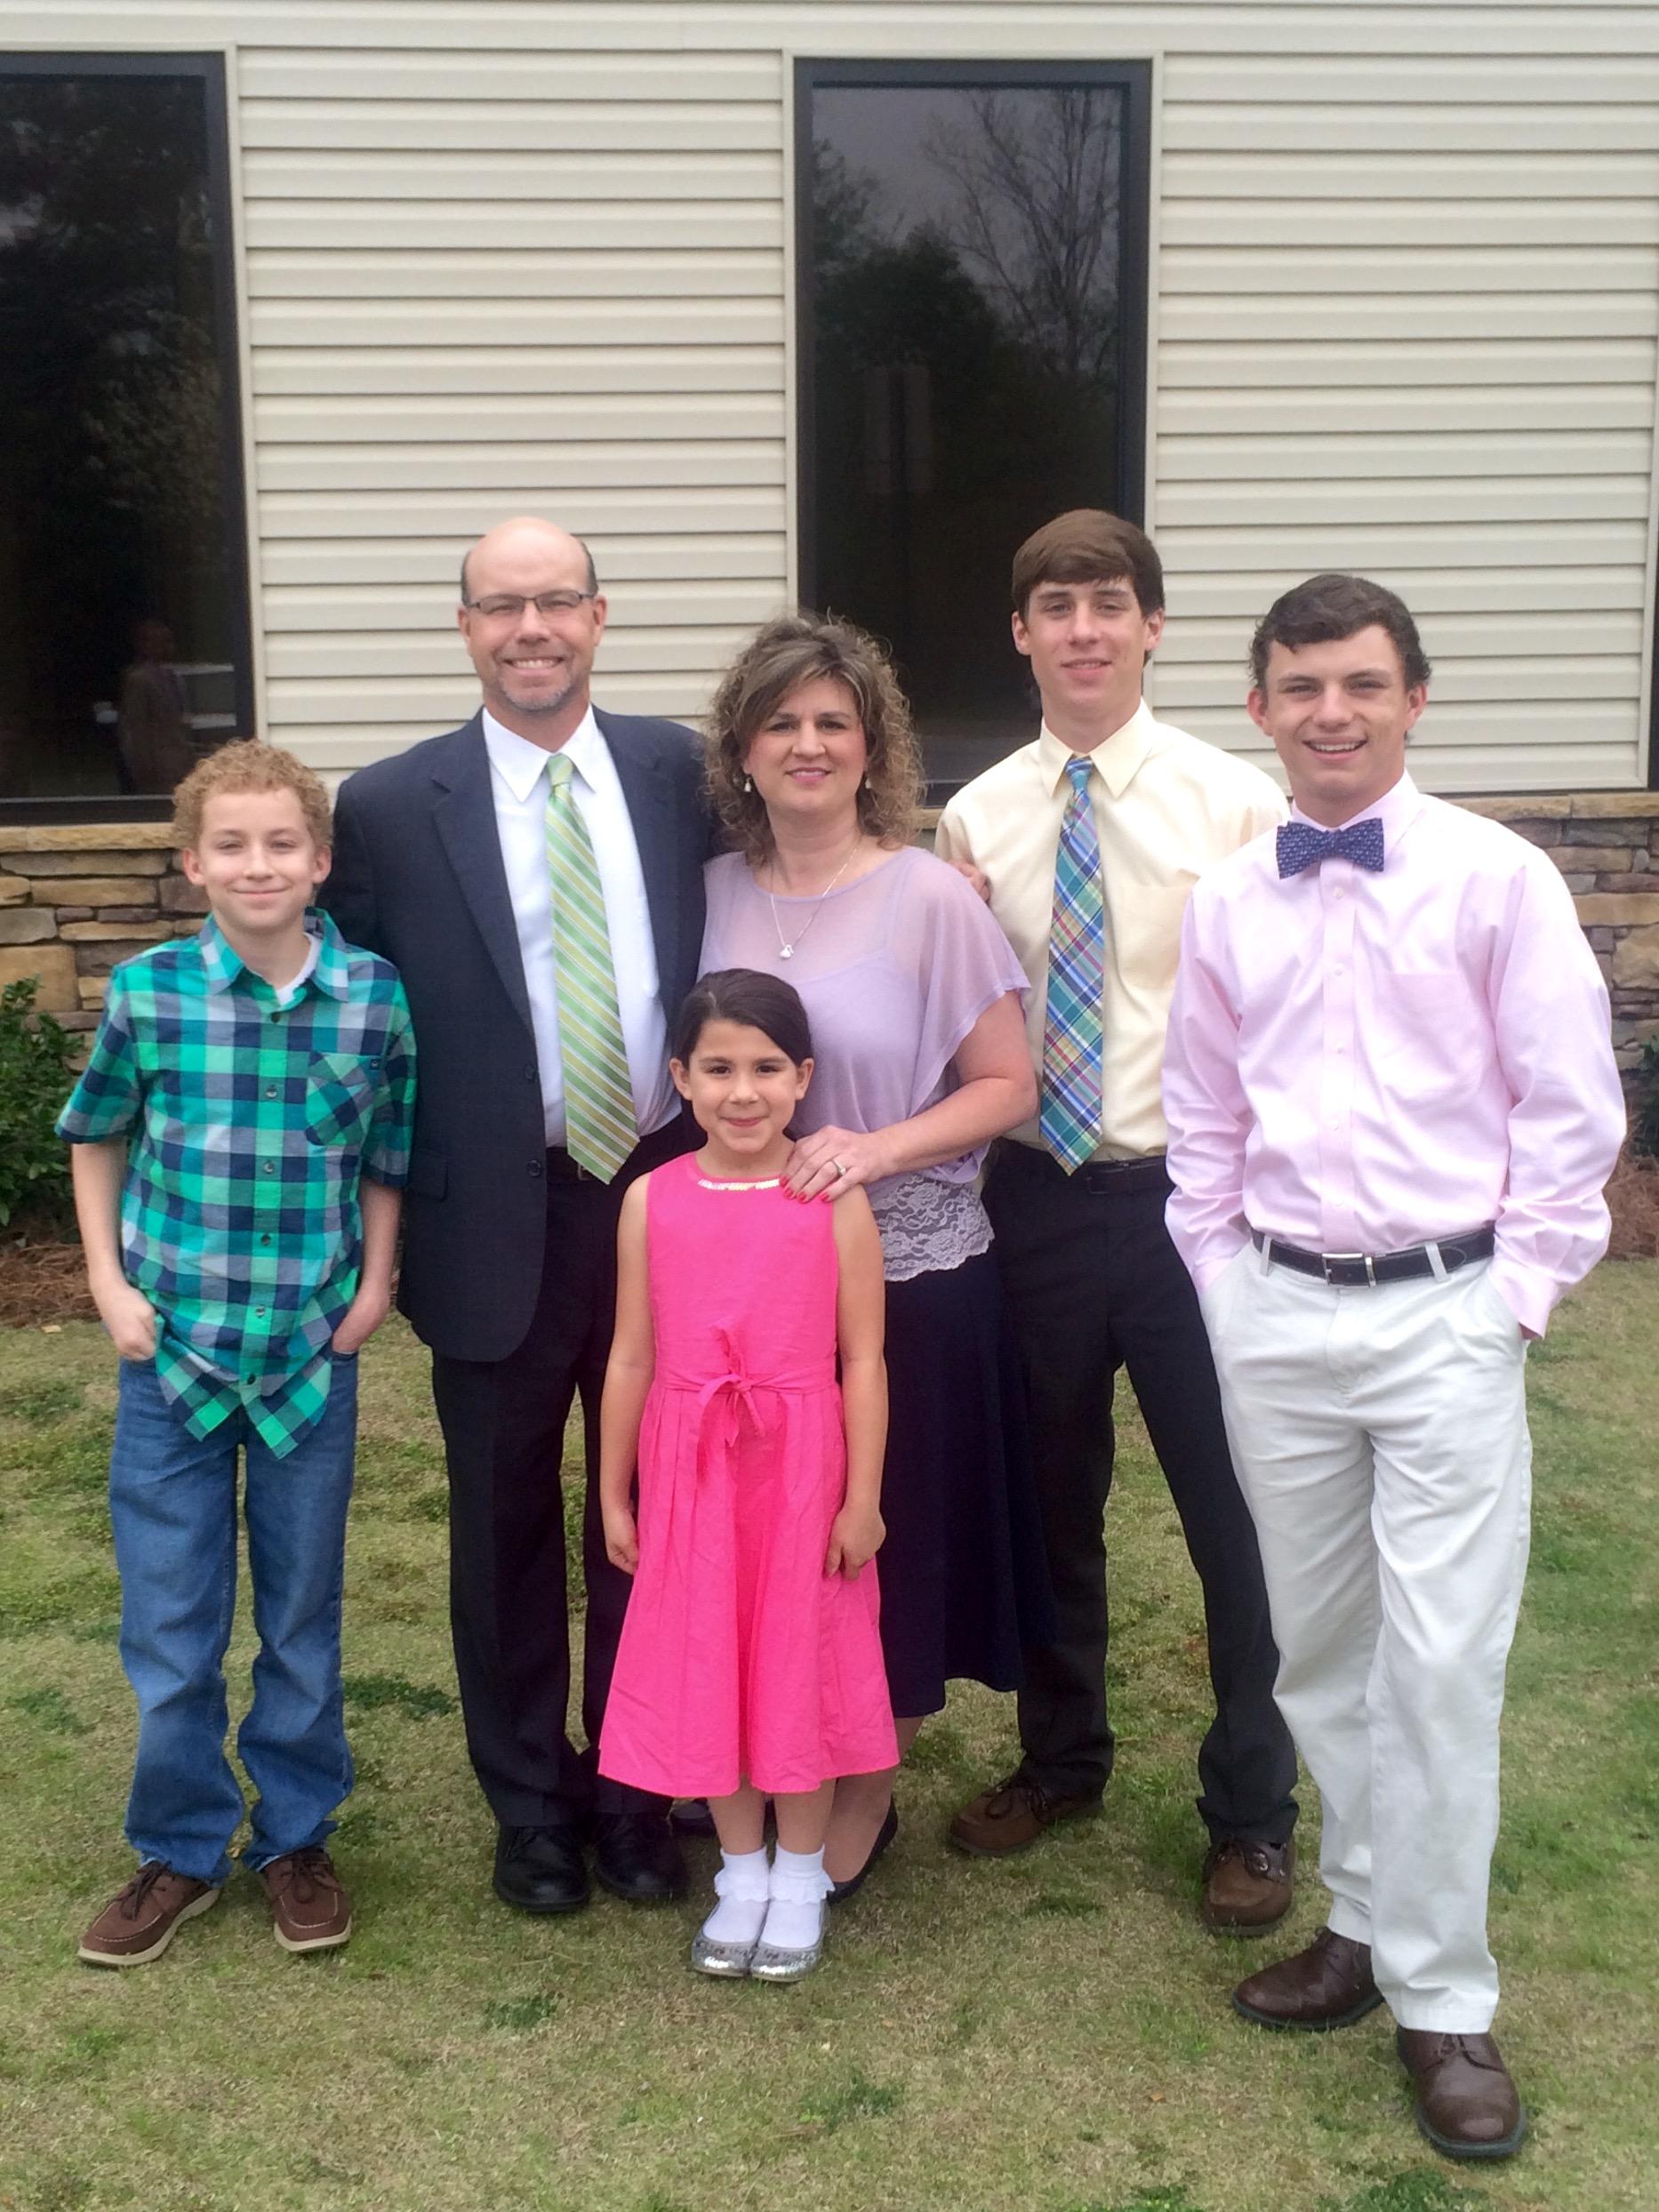 The Gallatin Family